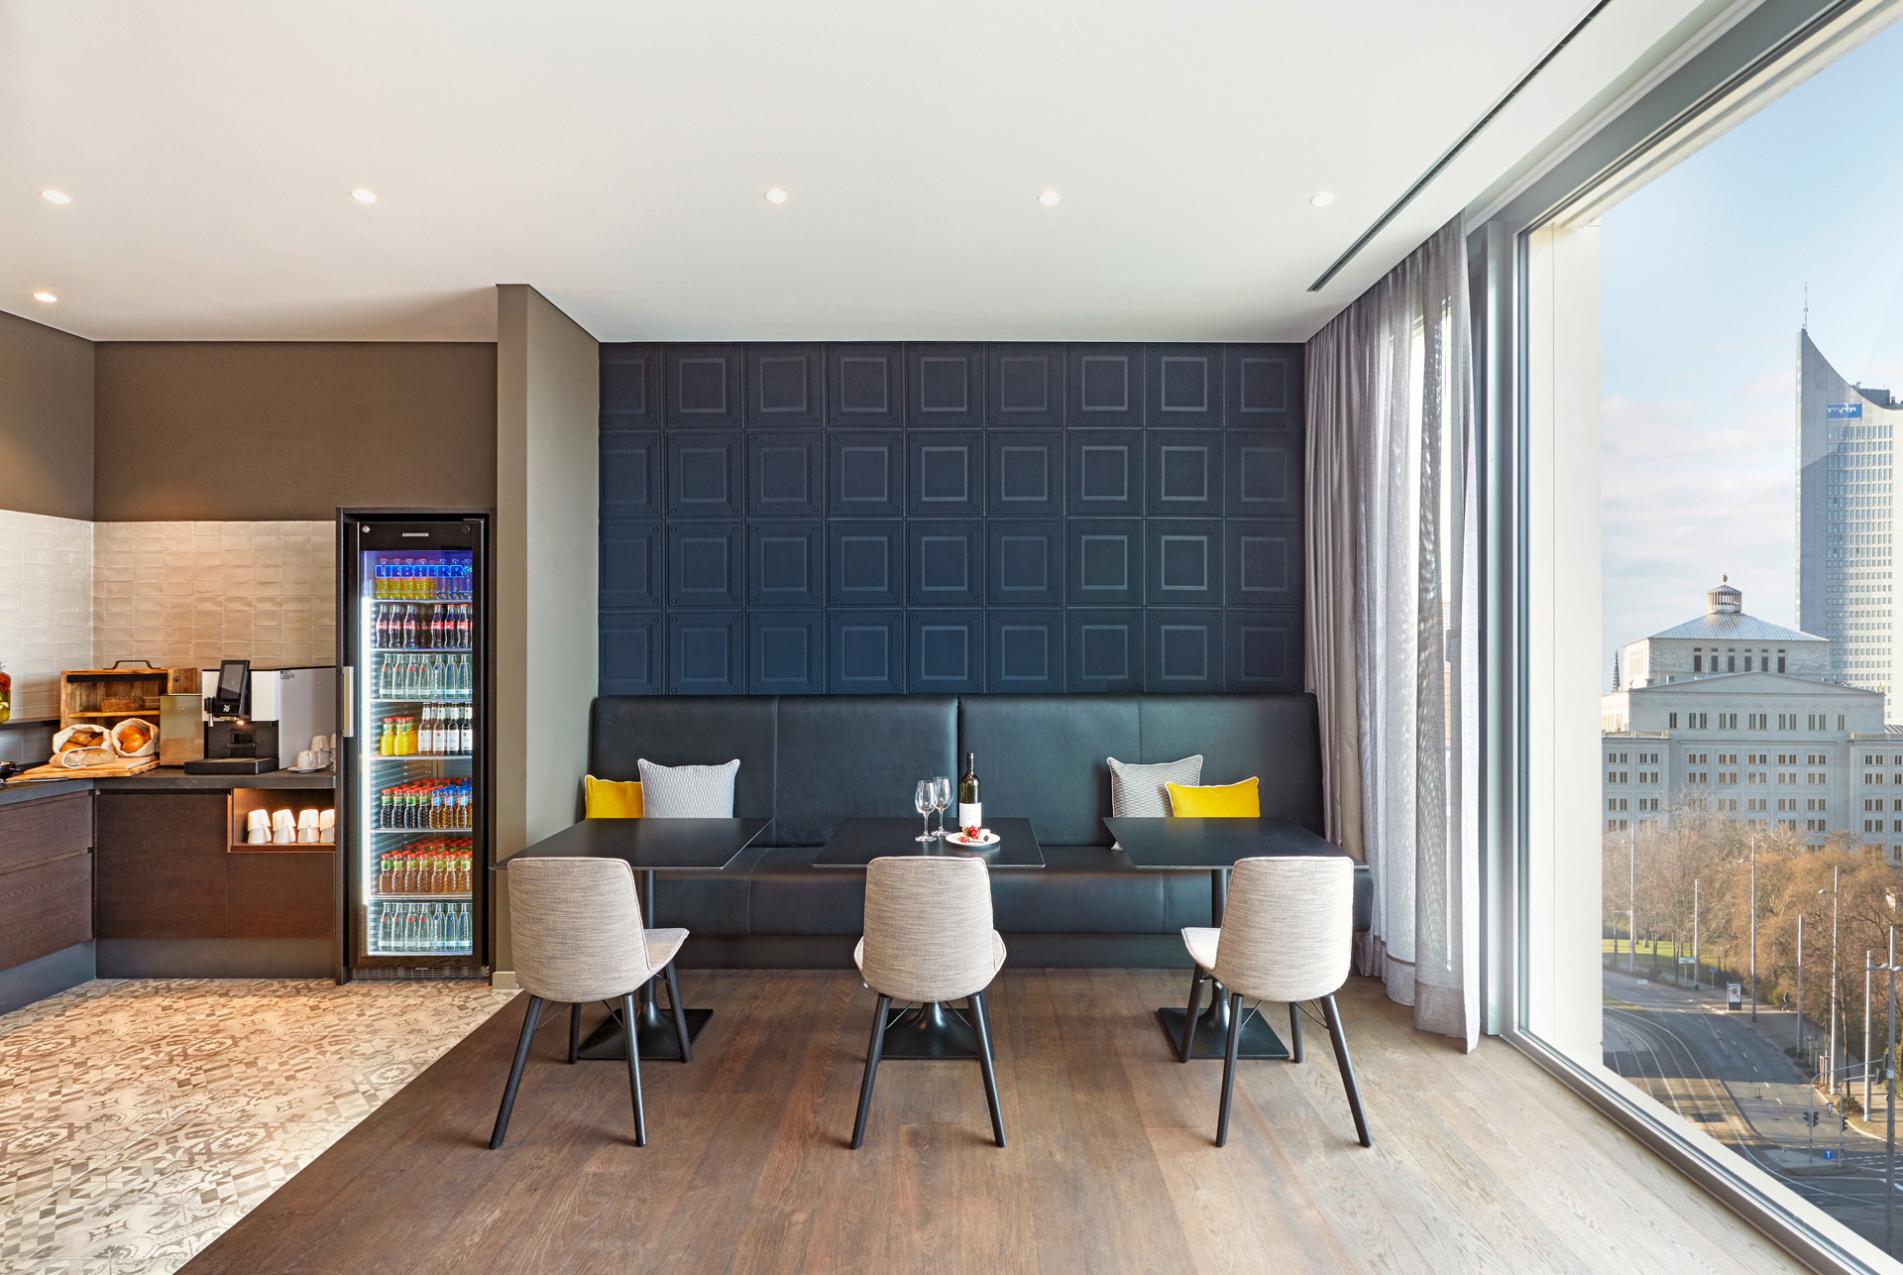 H Hotels Executive Lounge 02 Hyperion Hotel Leipzig Original (kommerz